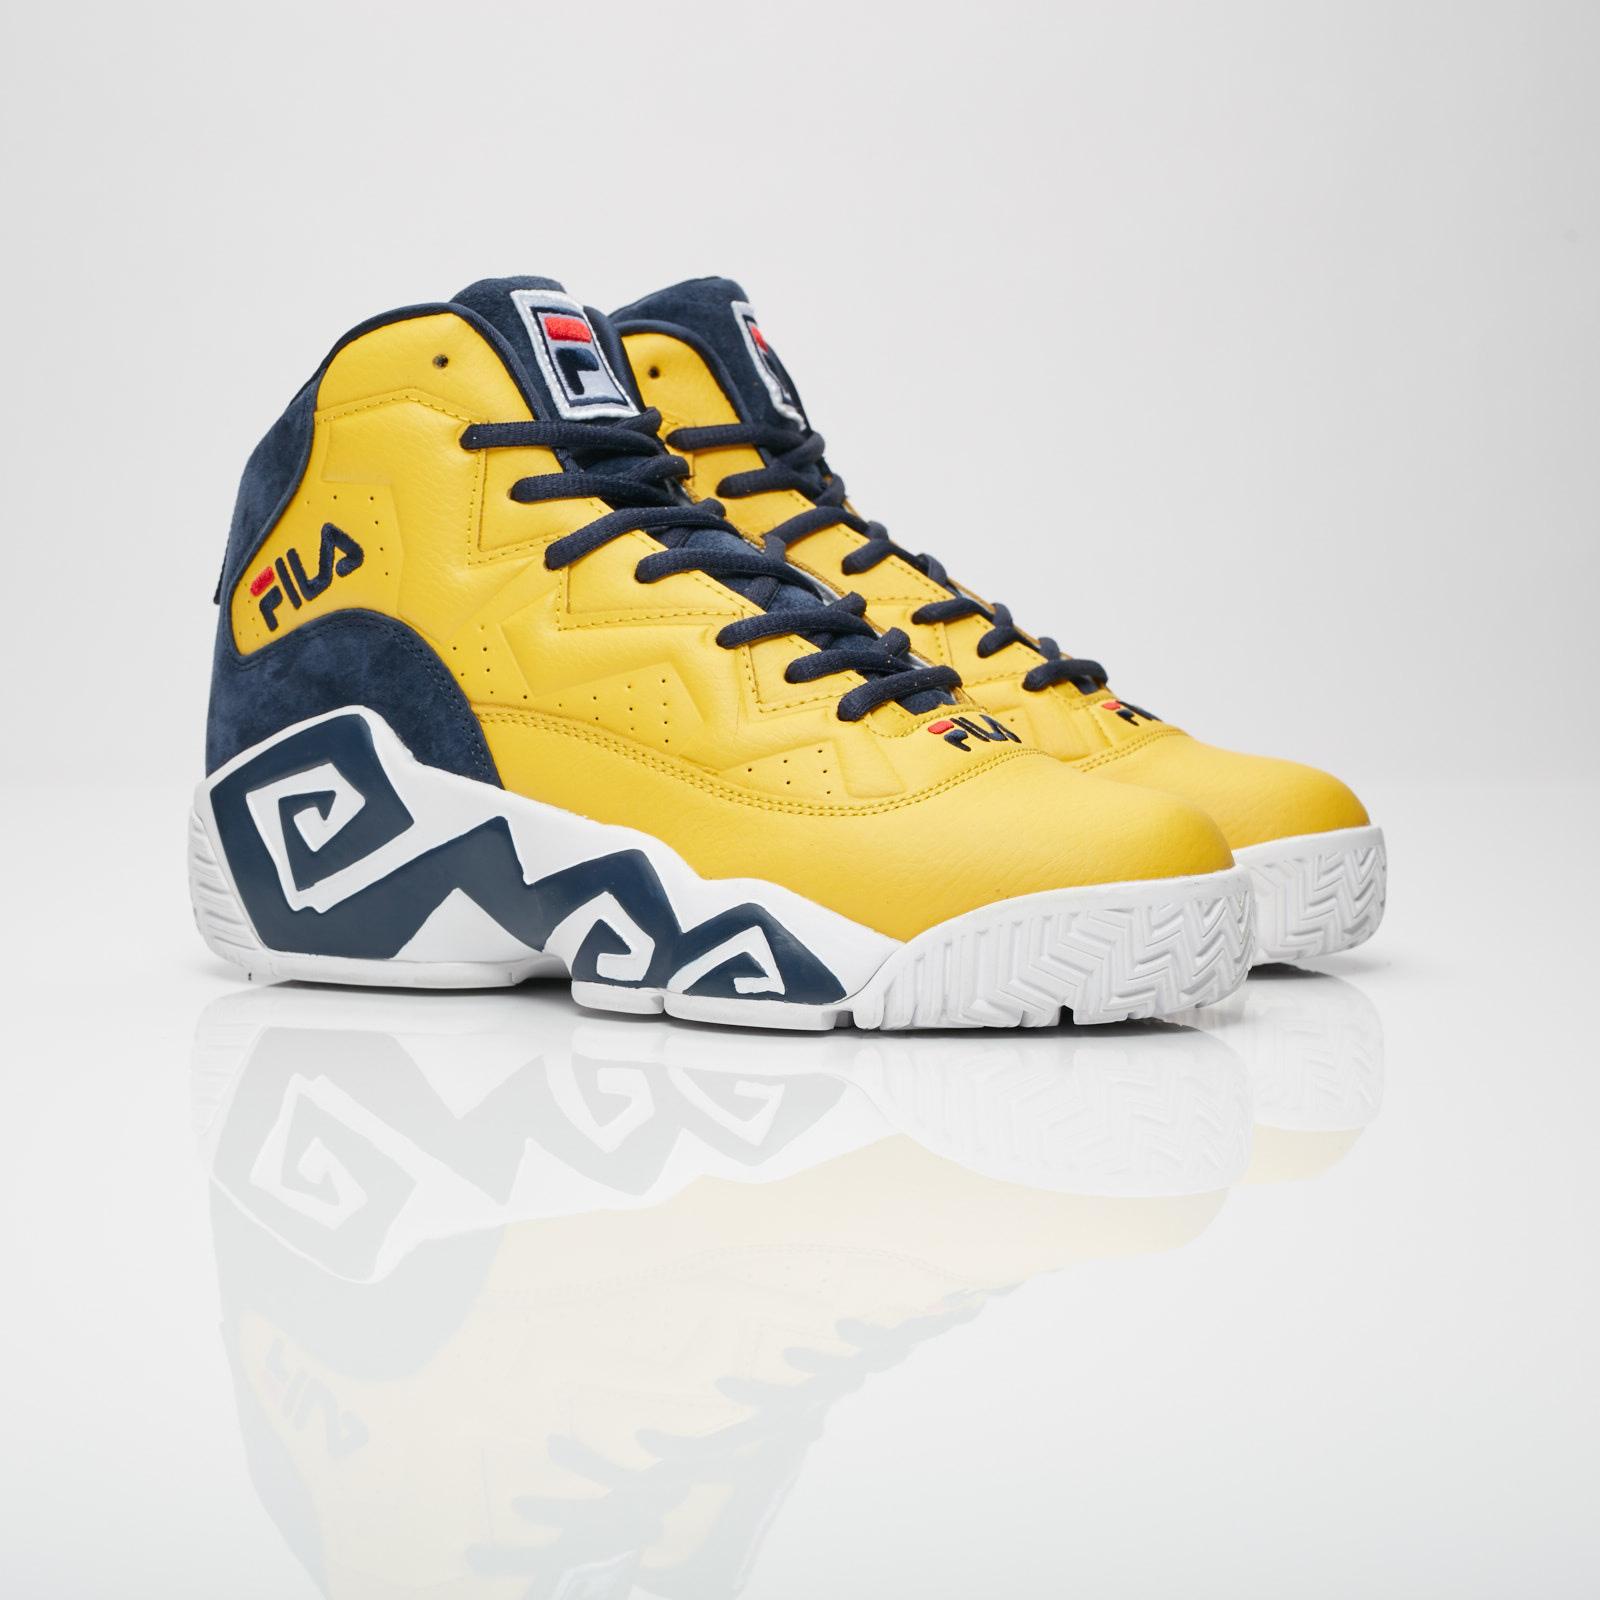 89f5fb303d78 Fila MB - 1bm00048-725 - Sneakersnstuff